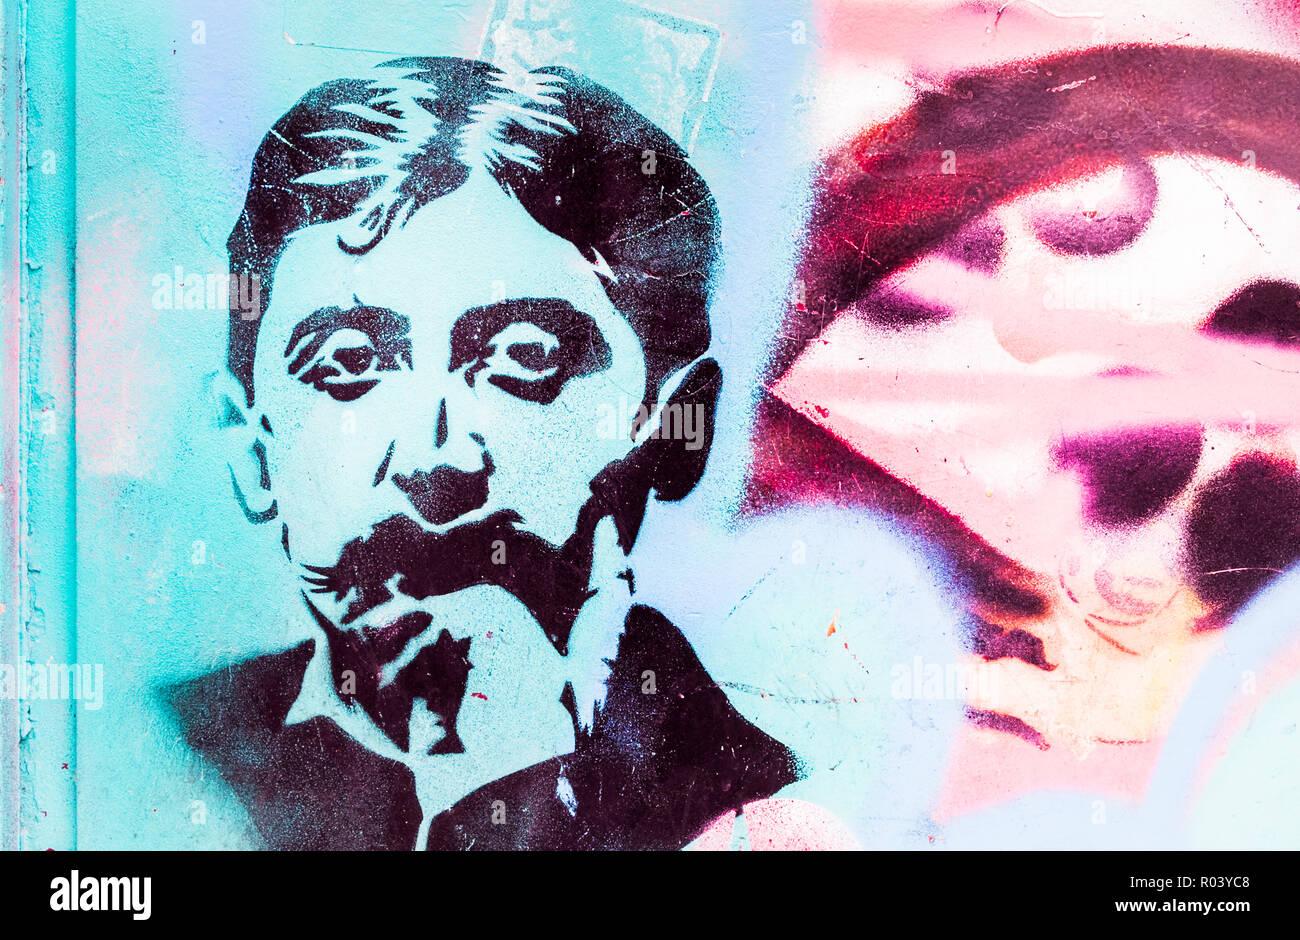 Schablone Porträt des französischen Schriftstellers Marcel Proust paris, Ile de France, Frankreich Stockbild